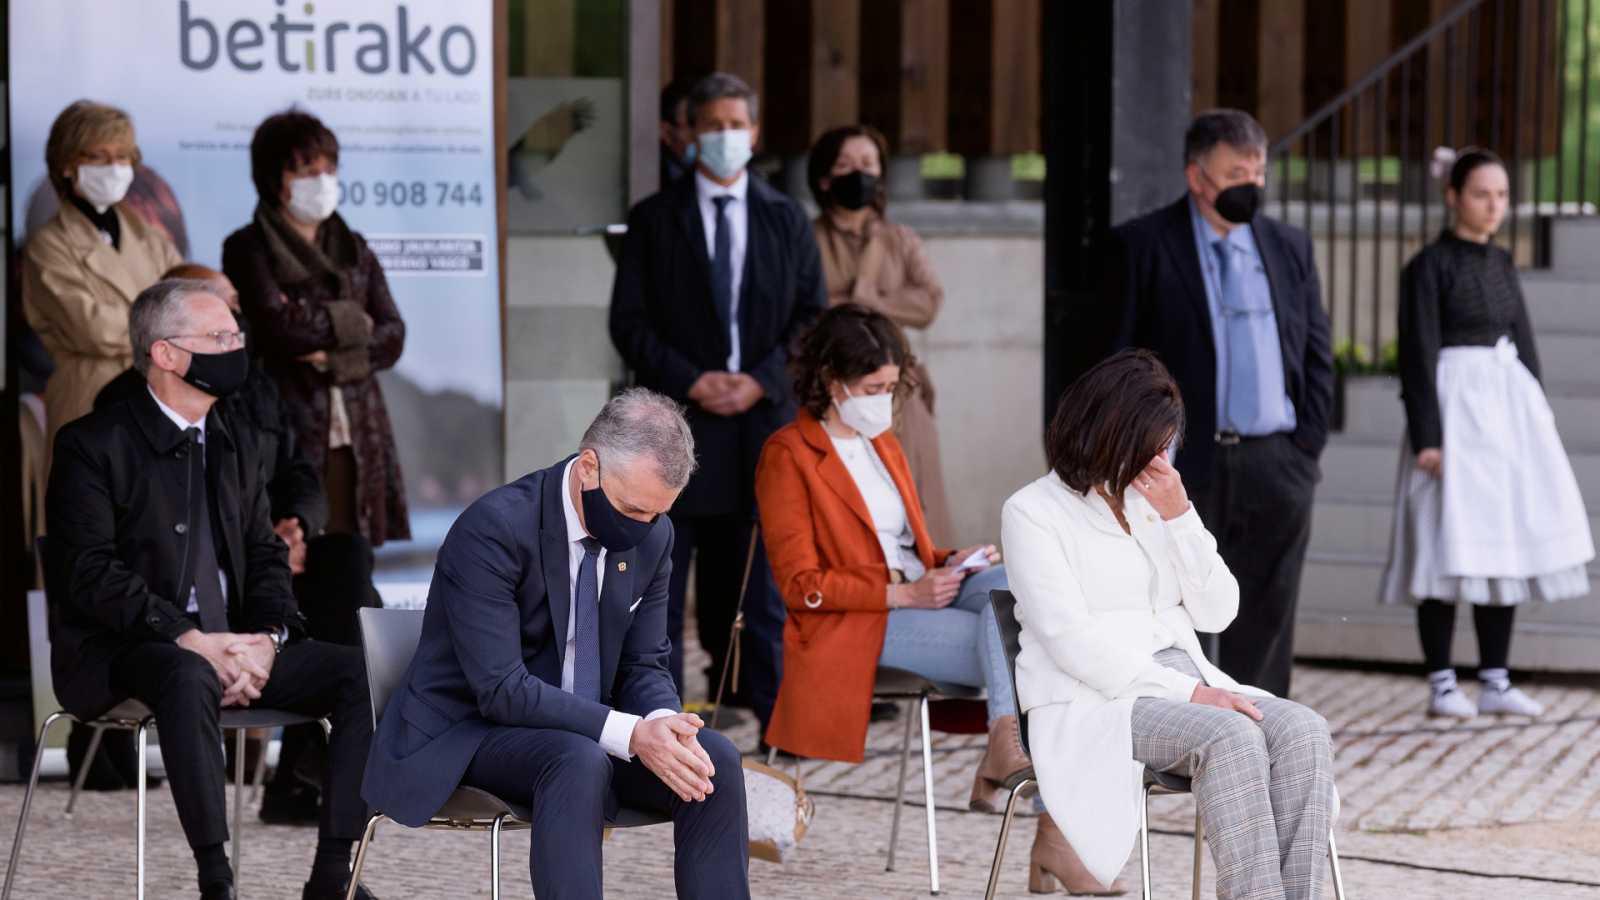 14 Horas Fin de Semana - Homenaje a las víctimas de COVID19 en Euskadi - Escuchar ahora